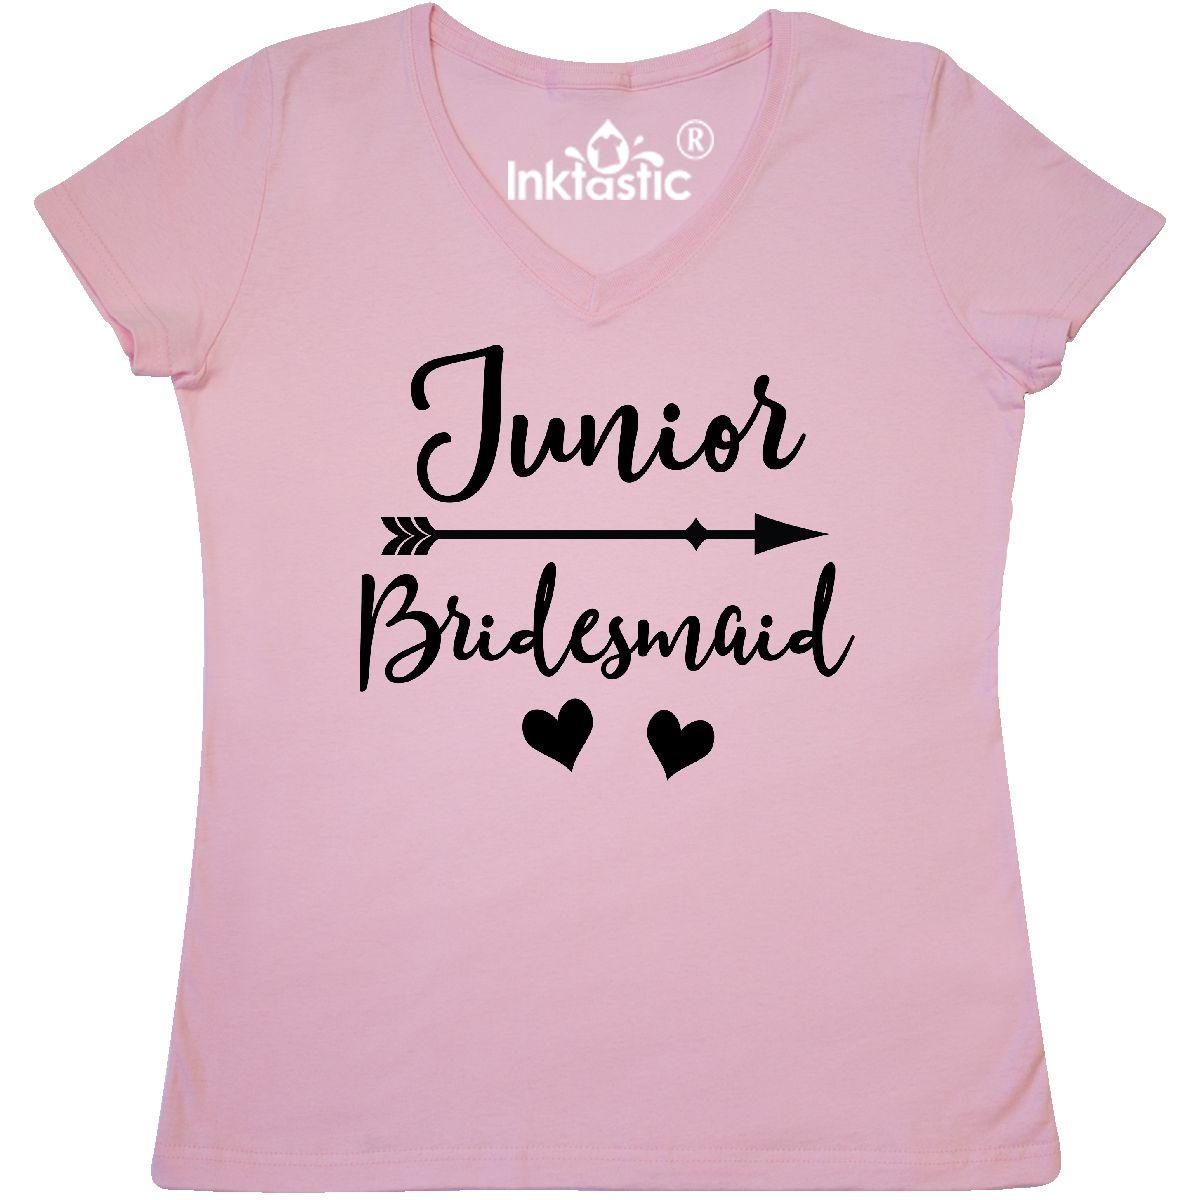 cd6e30a97351b Details about Inktastic Junior Bridesmaid Wedding Bridal Party Gift Women's  V-Neck T-Shirt Fun